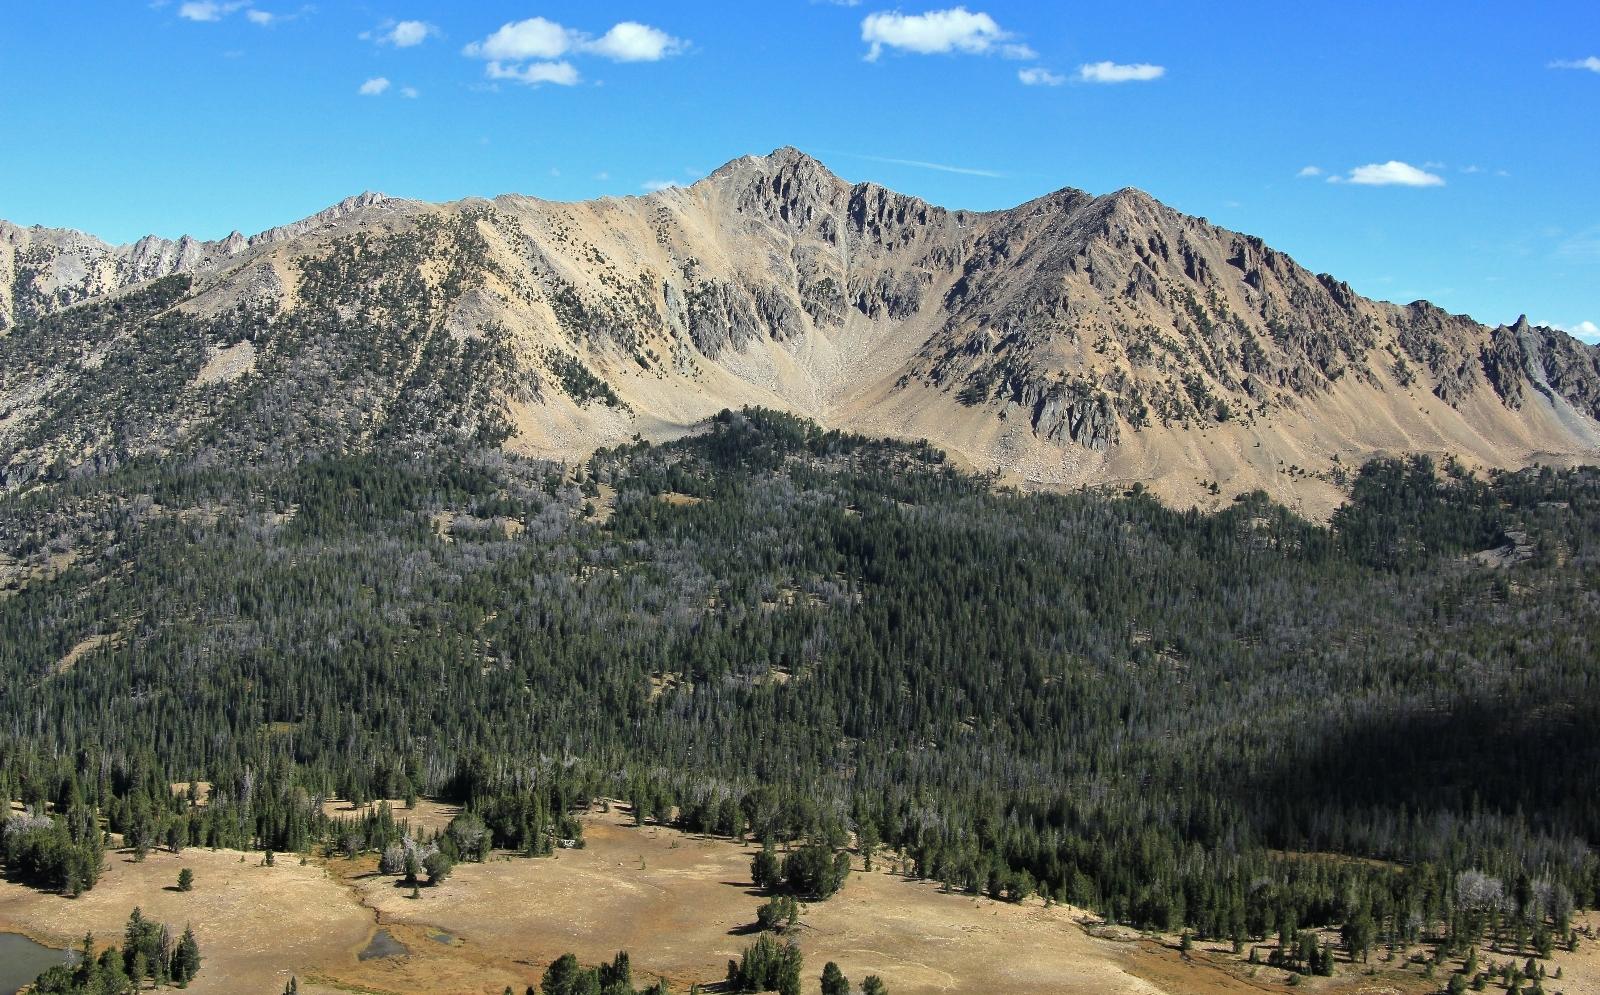 09-22-15 Born Lakes ridgeline hike (96)